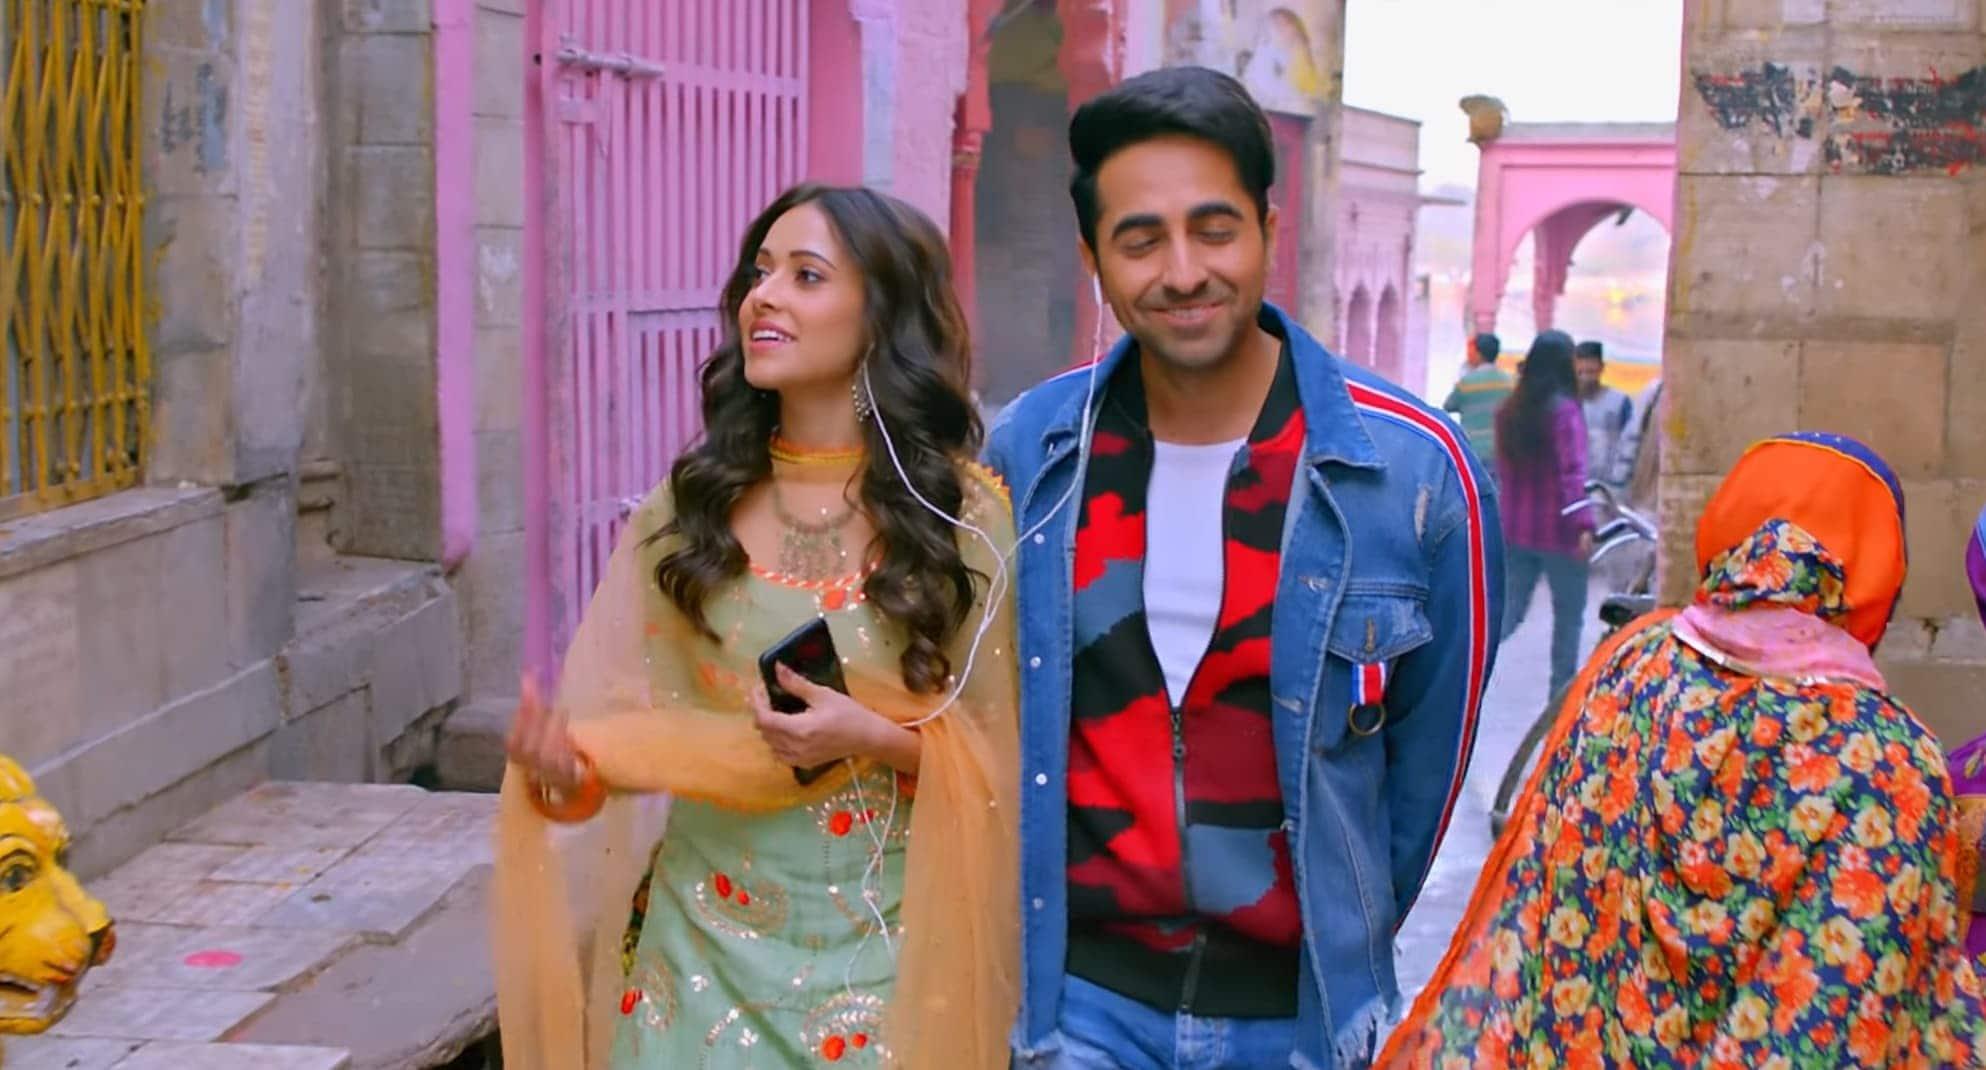 Dream Girl 'Ek Mulaqat' Song : Ayushmann Khurrana And Nushrat Bharucha's New Song Sounds Like Mere Rashke Qamar And Bulleya Had A Baby